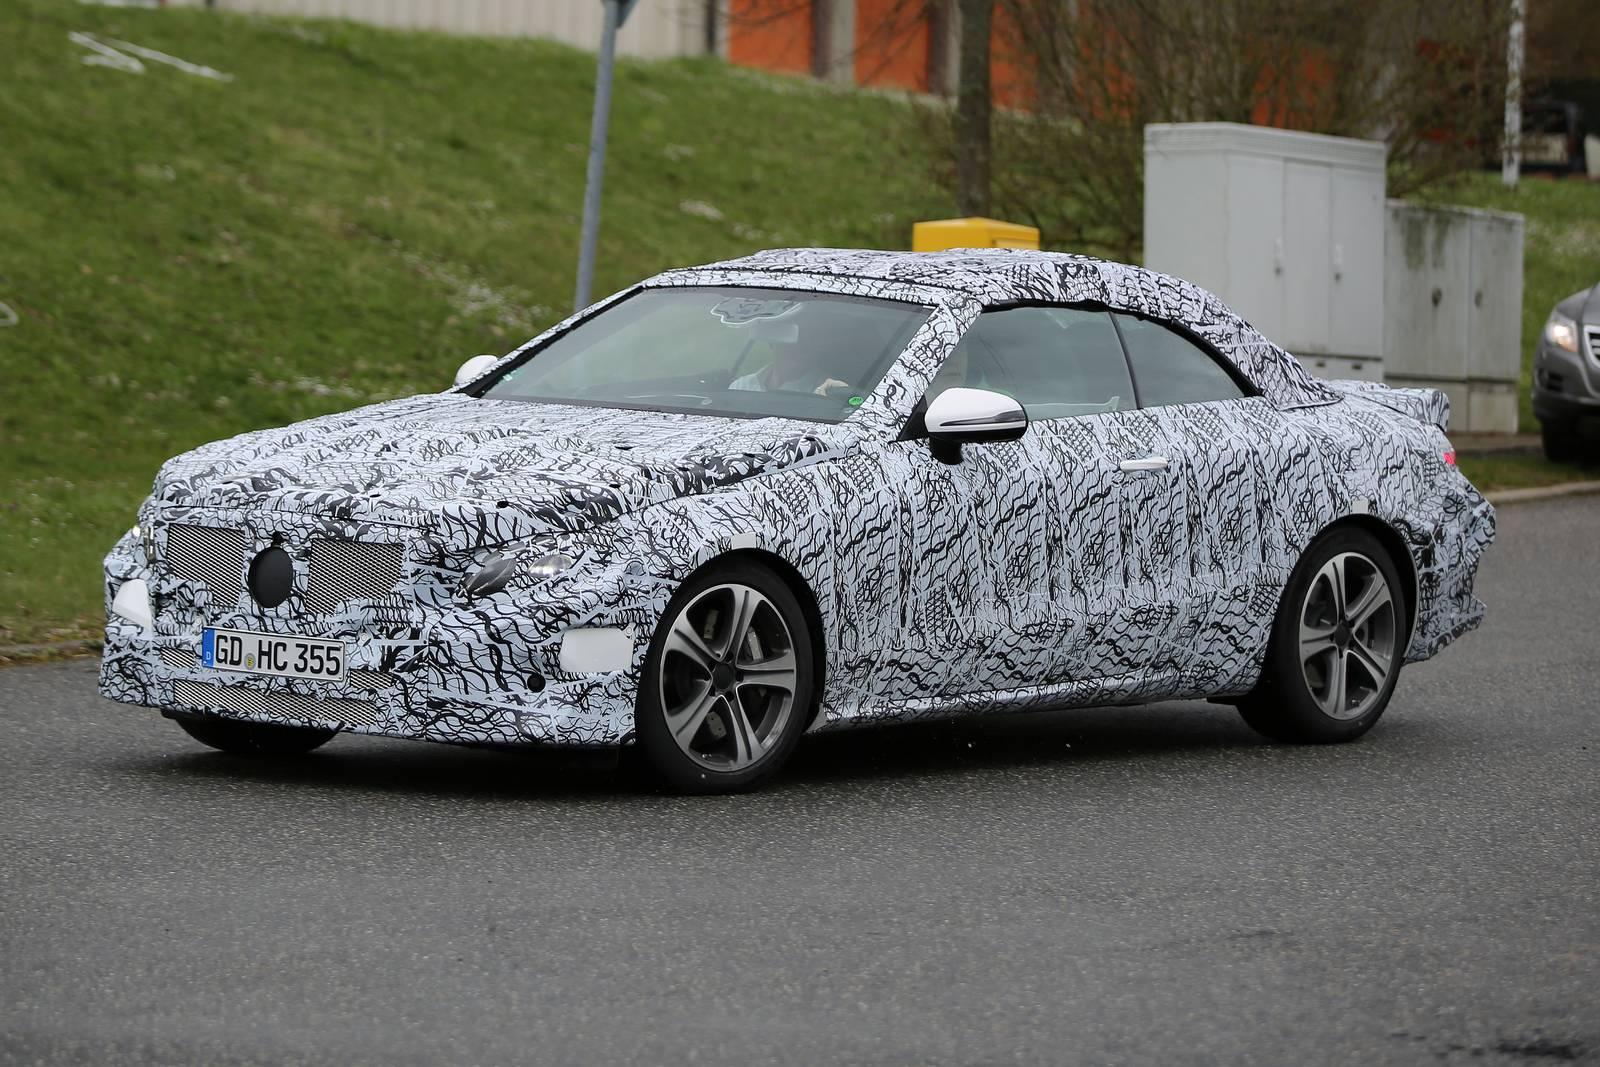 2018 mercedes benz e class cabriolet spy shots gtspirit for Mercedes benz g cabriolet